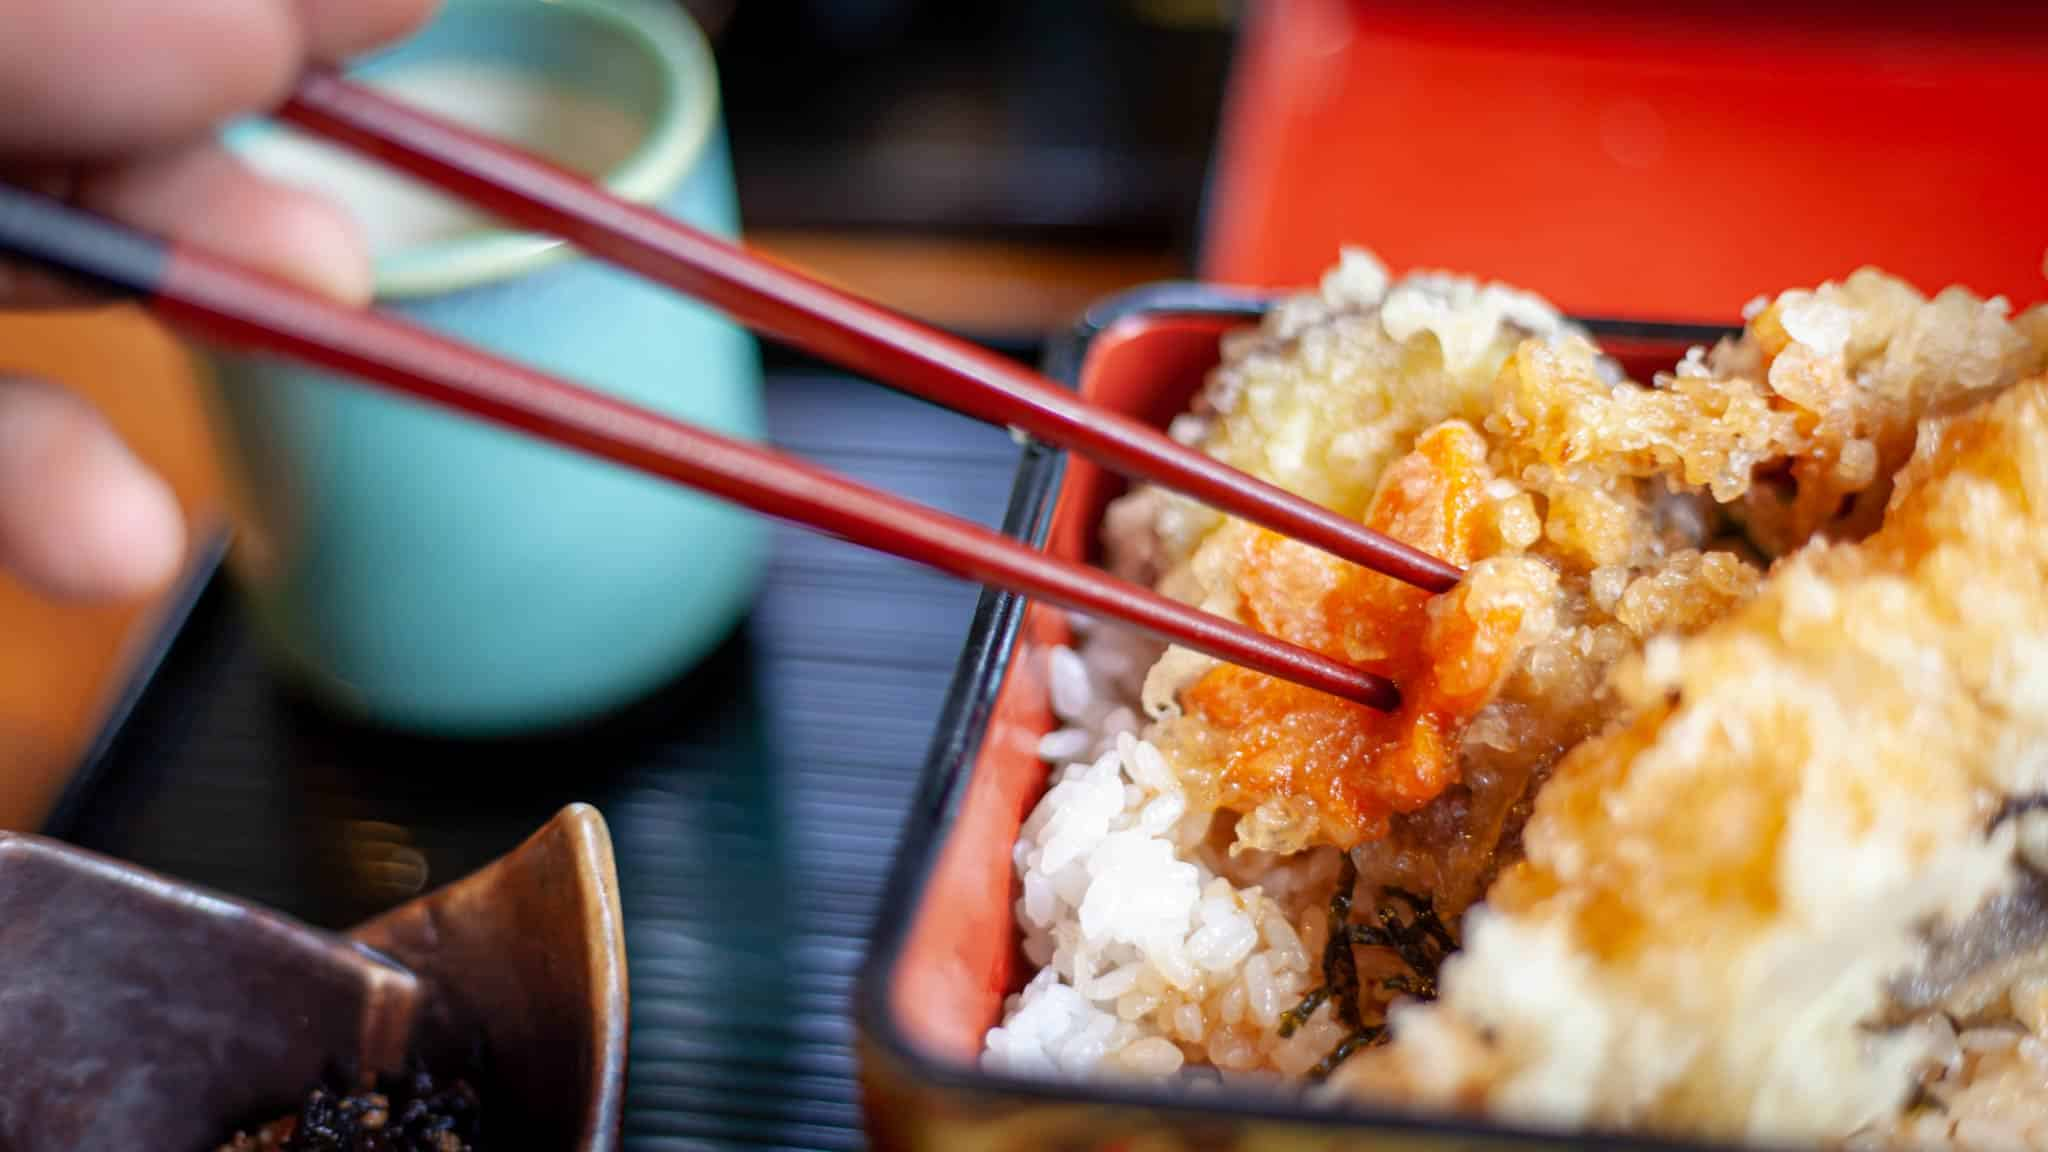 Food is one of Tokyo's greatest pleasures!